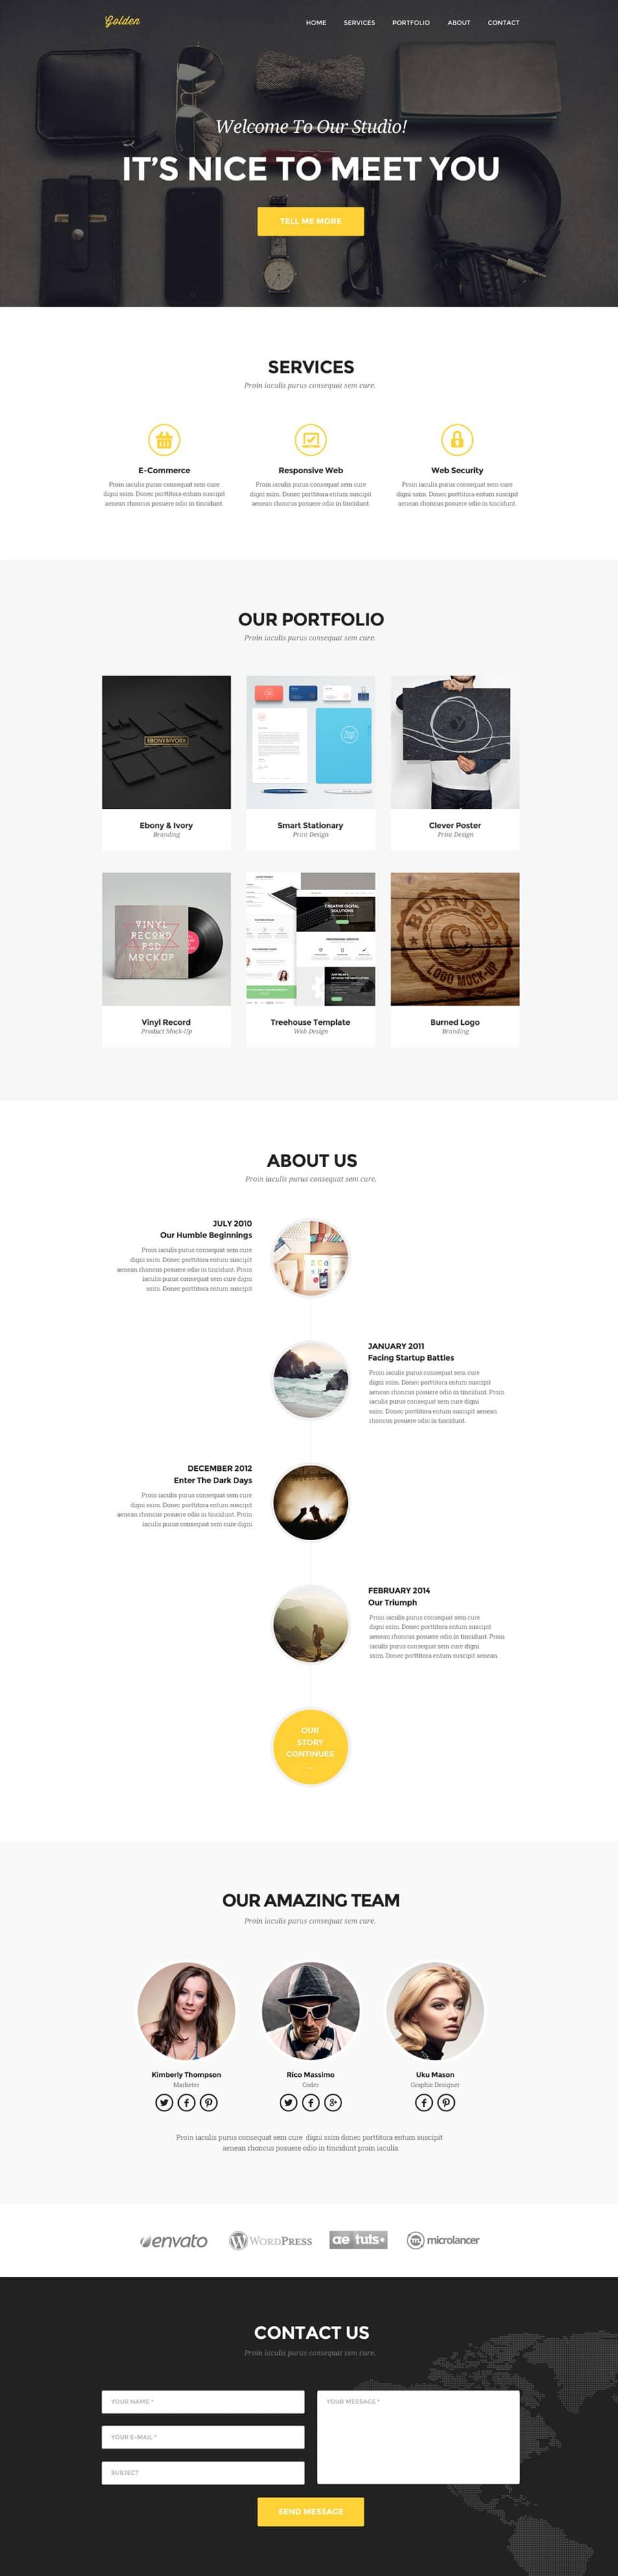 Golden – One page portfolio PSD